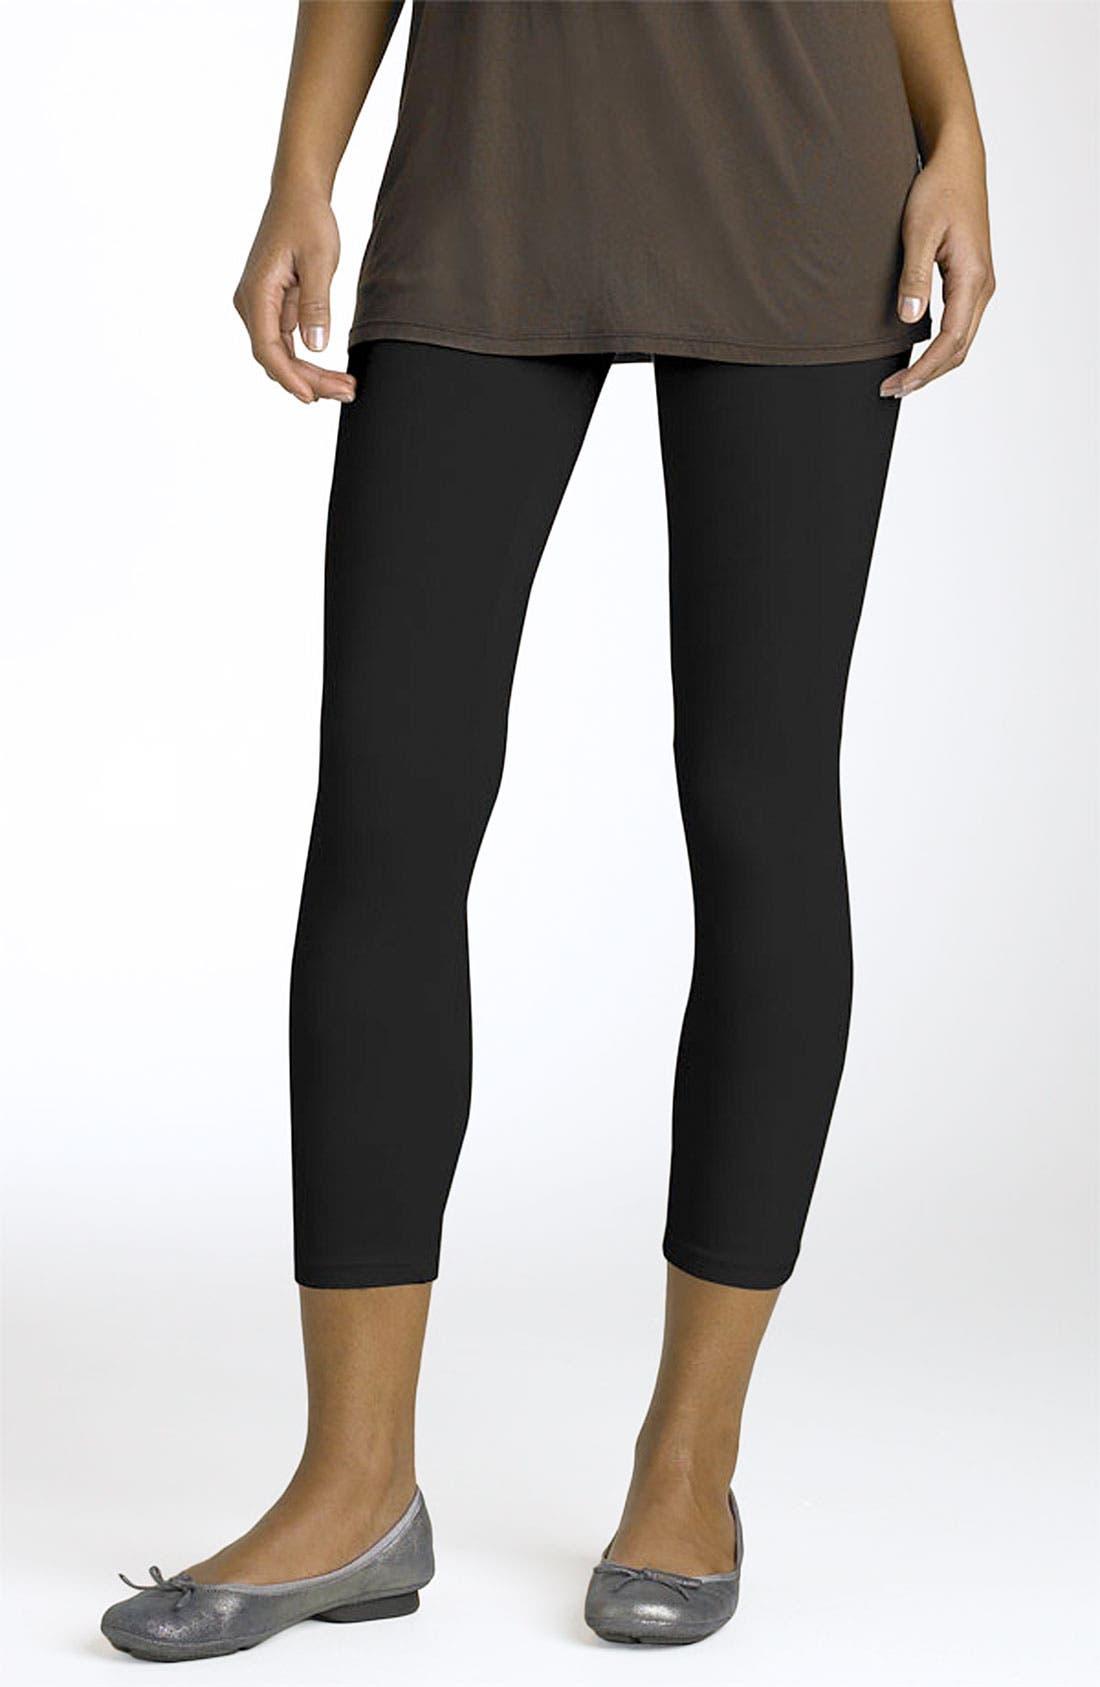 Main Image - Splendid Crop Stretch Knit Leggings